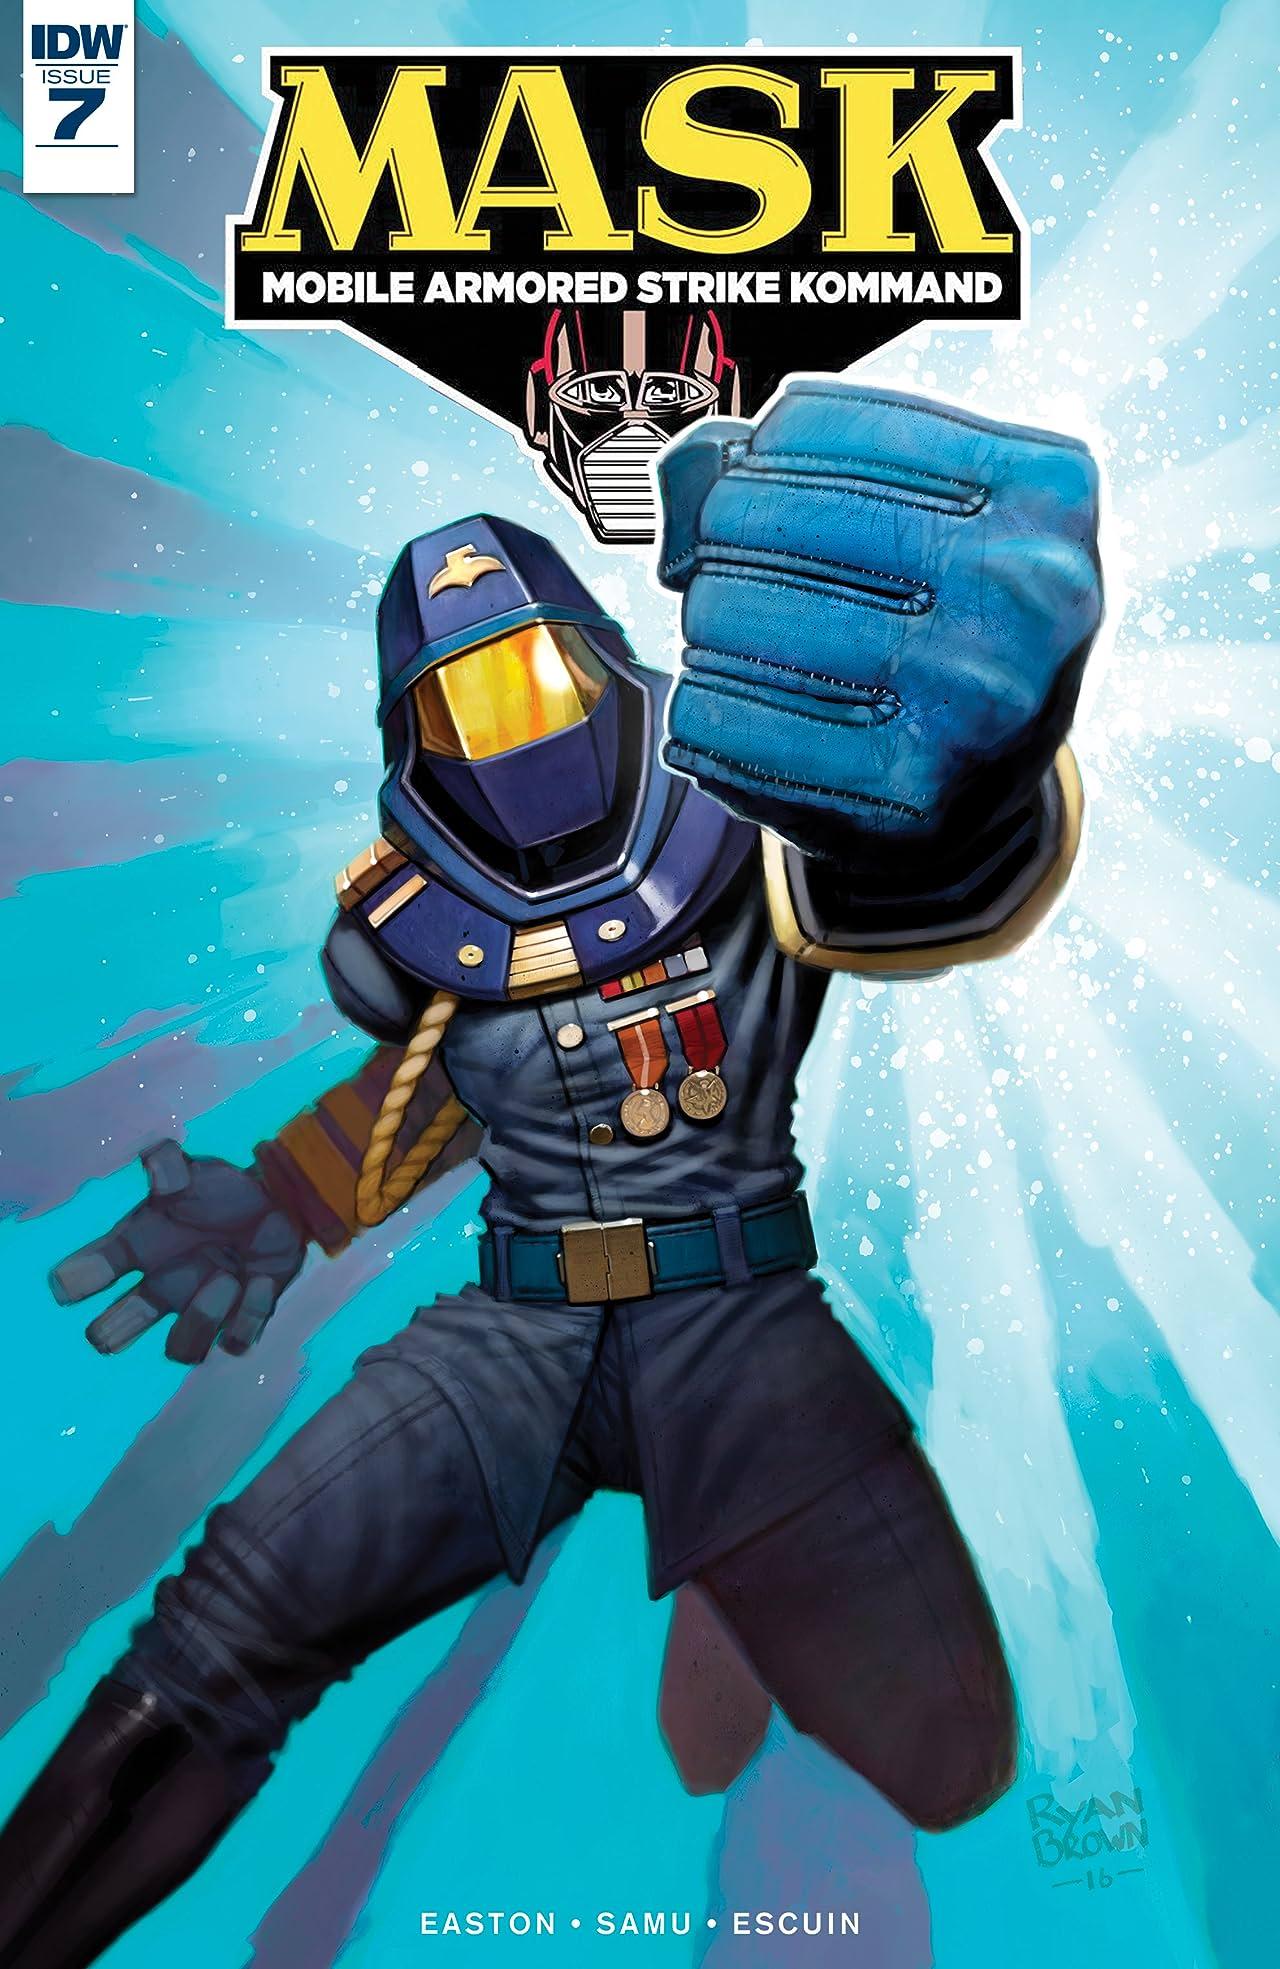 M.A.S.K.: Mobile Armored Strike Kommand #7